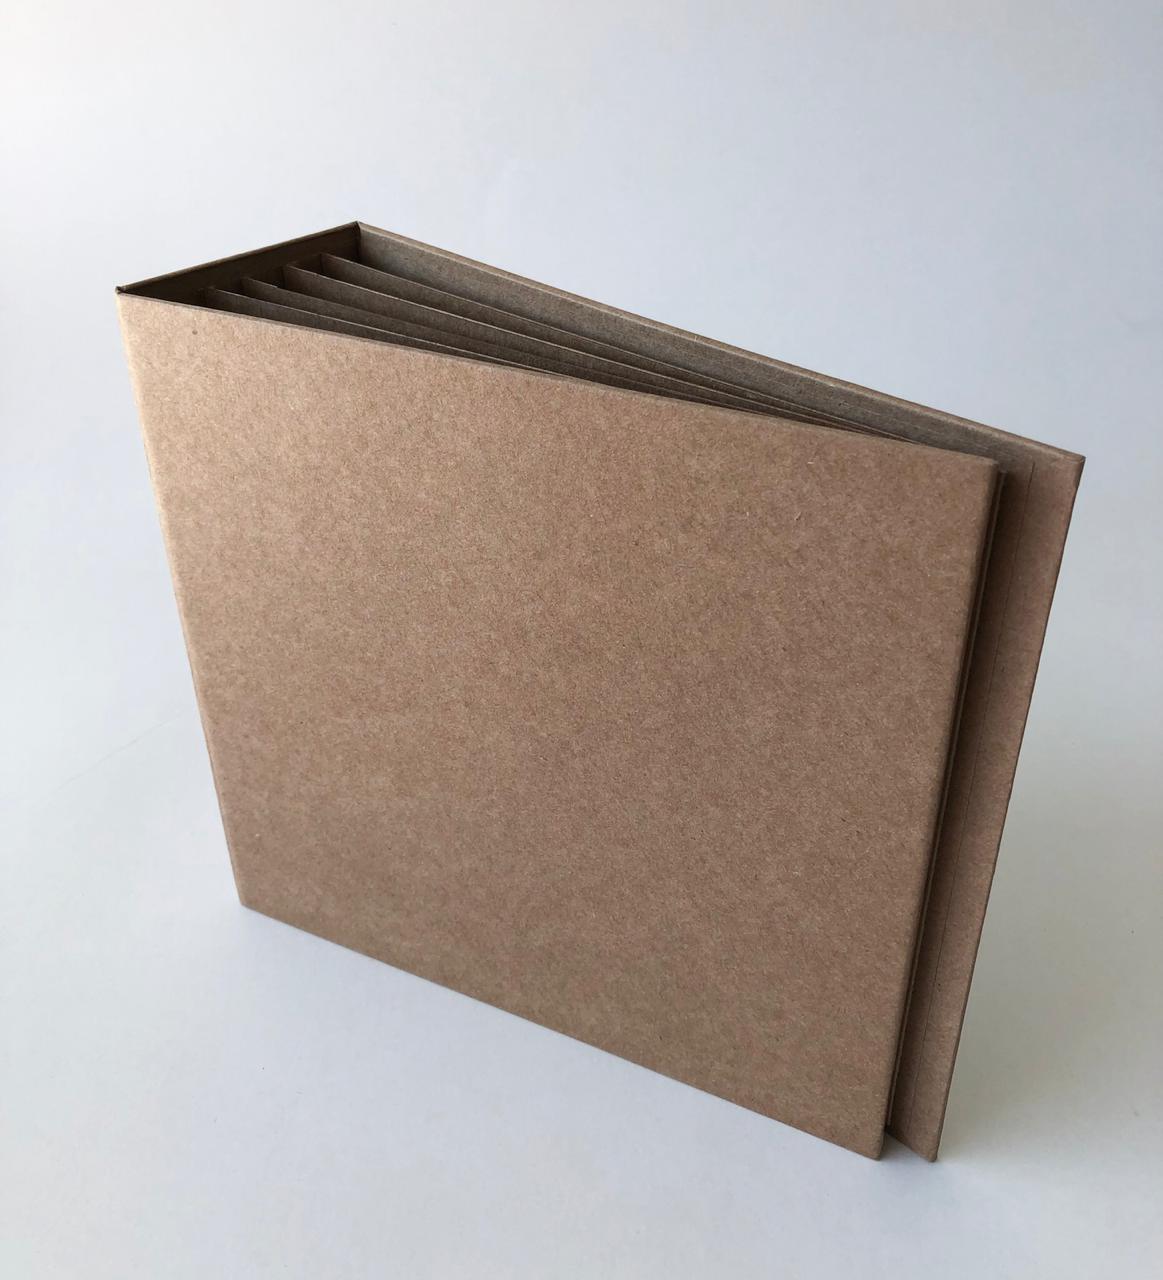 Álbum 20 x 20 com lombada Kraft - JuJu Scrapbook  - JuJu Scrapbook